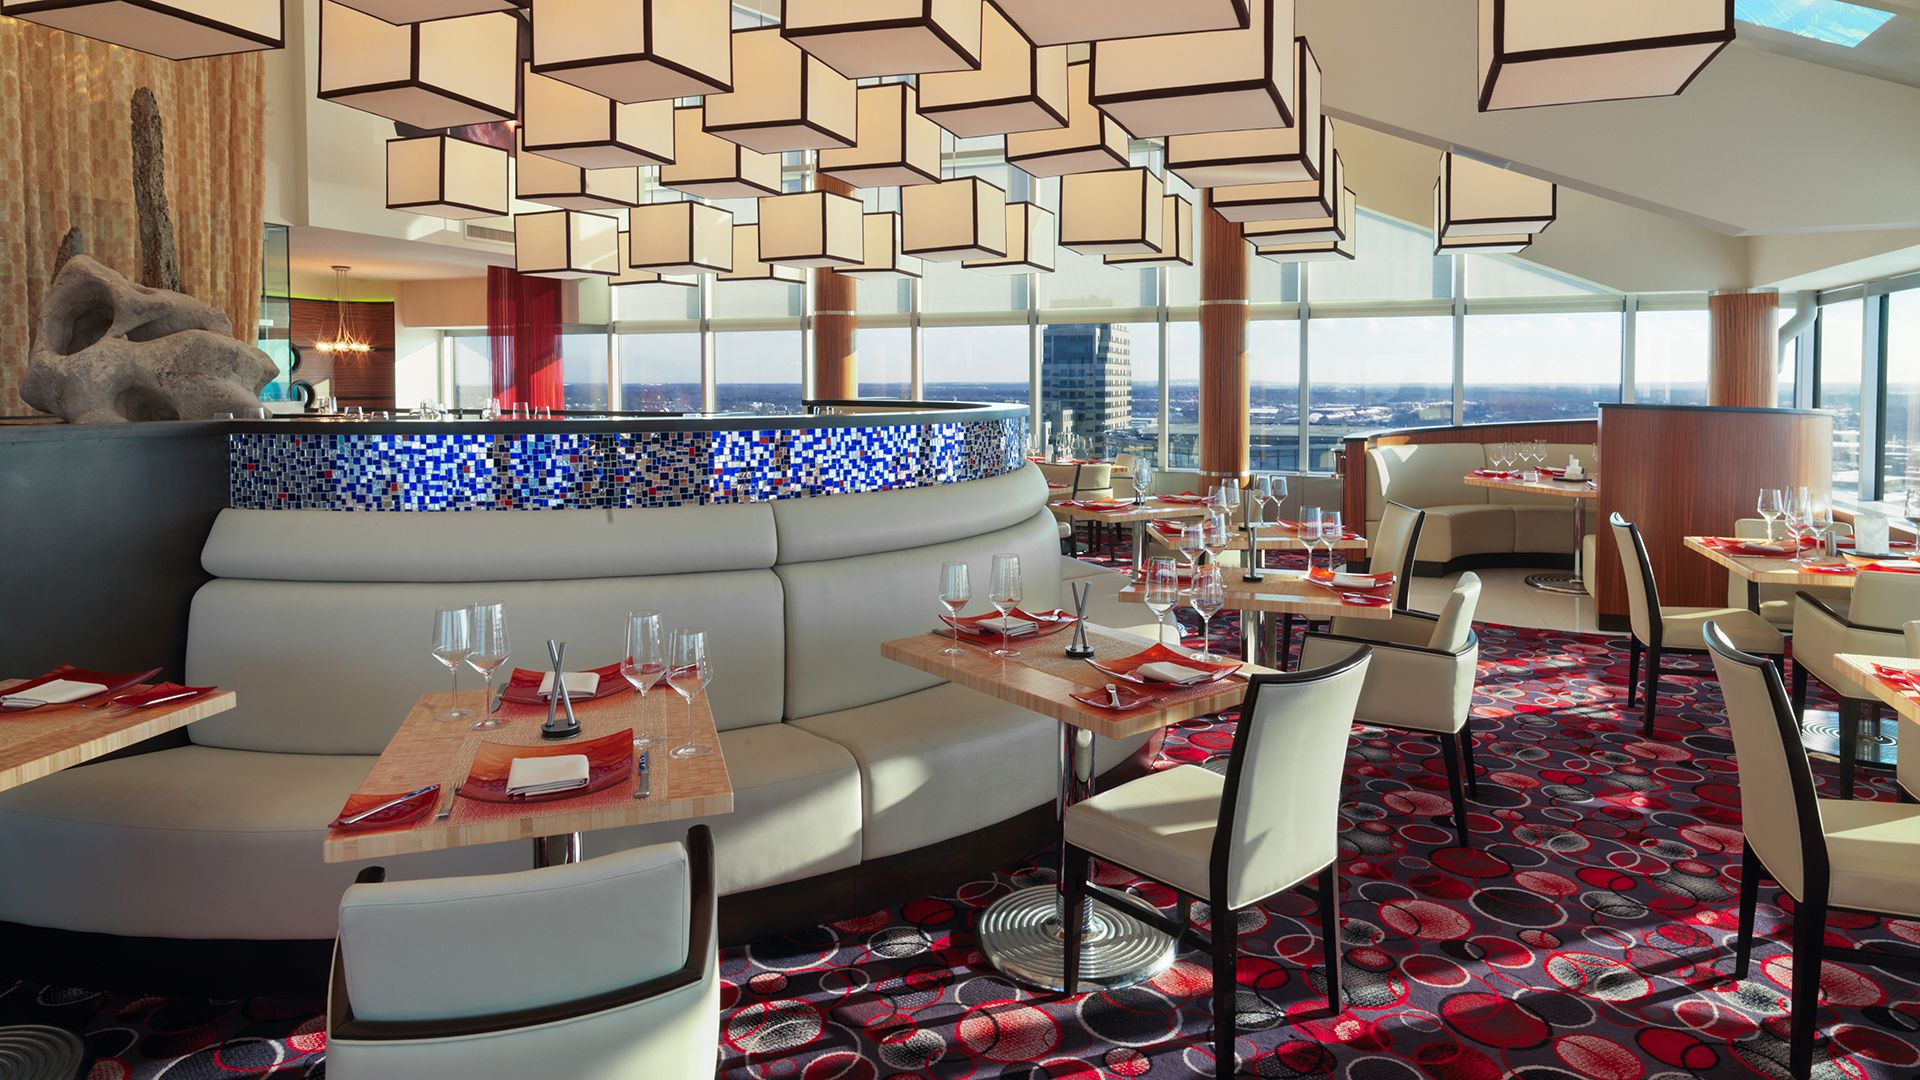 Amway Grand Plaza Hotel Dining Cygnus 27 Grand Plaza Grand Rapids Restaurants Plaza Hotel